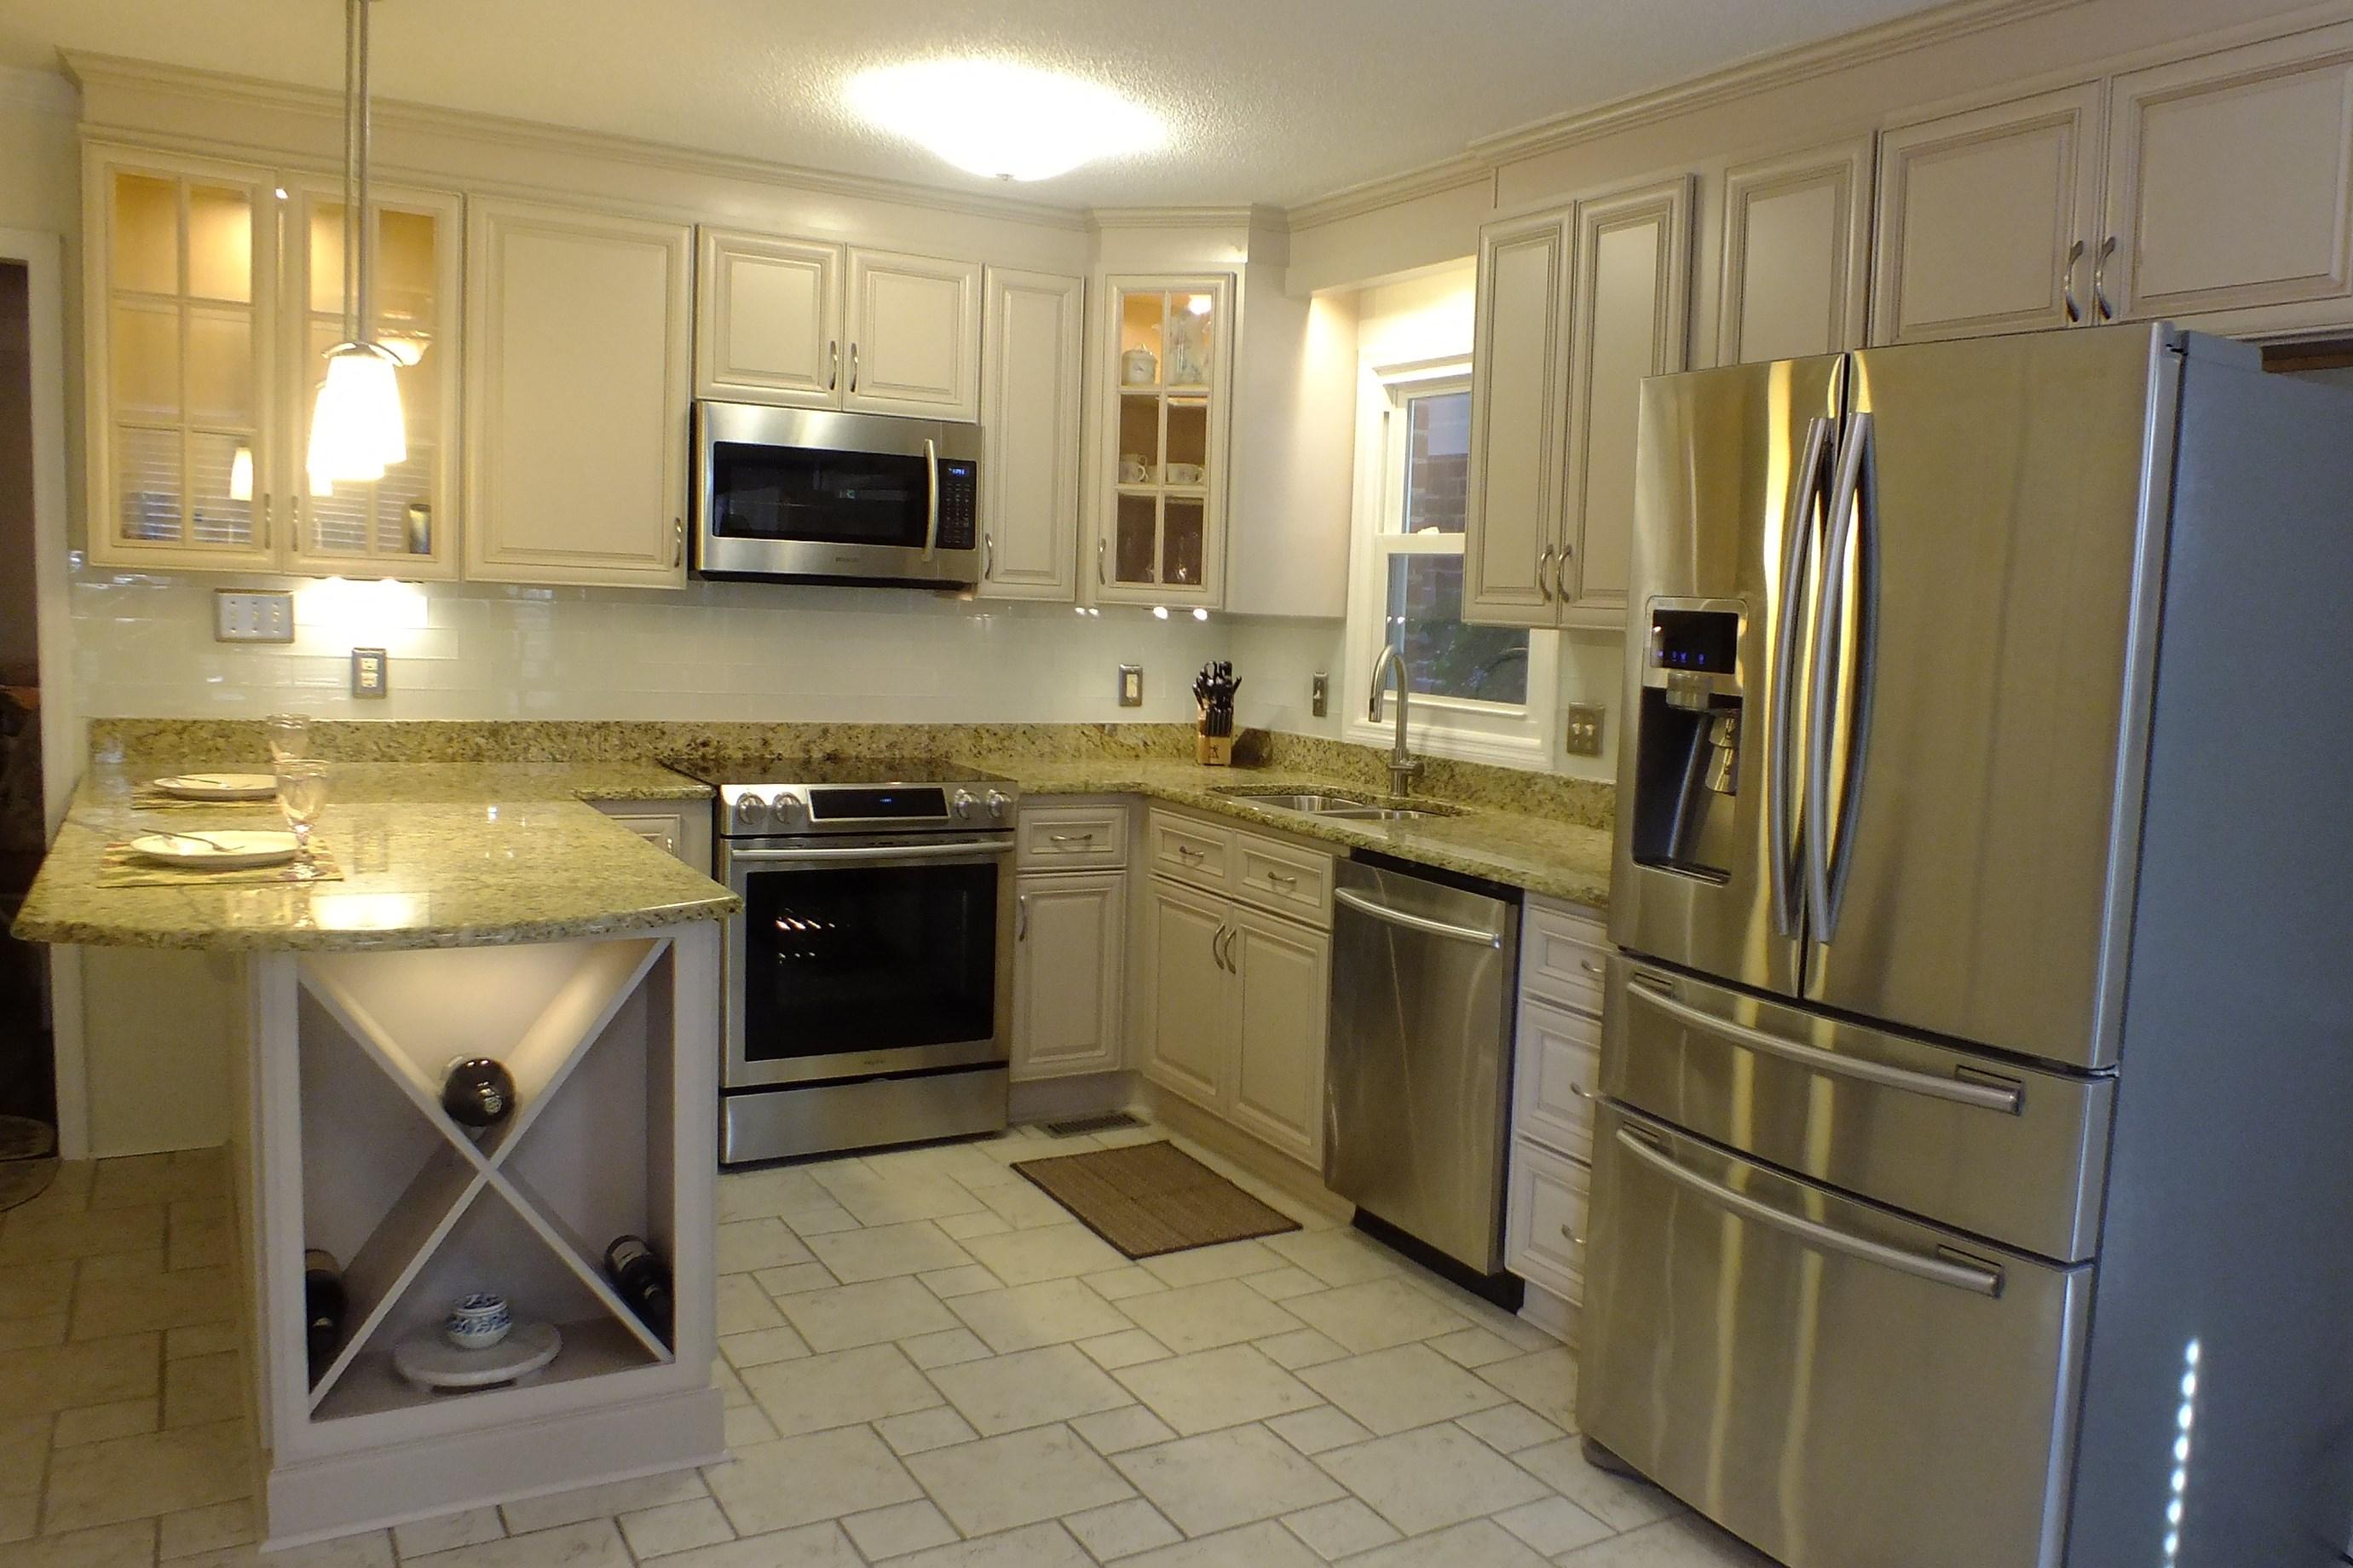 J J Kitchen Cabinets 926 Ramsey St Fayetteville Nc 28301 Yp Com